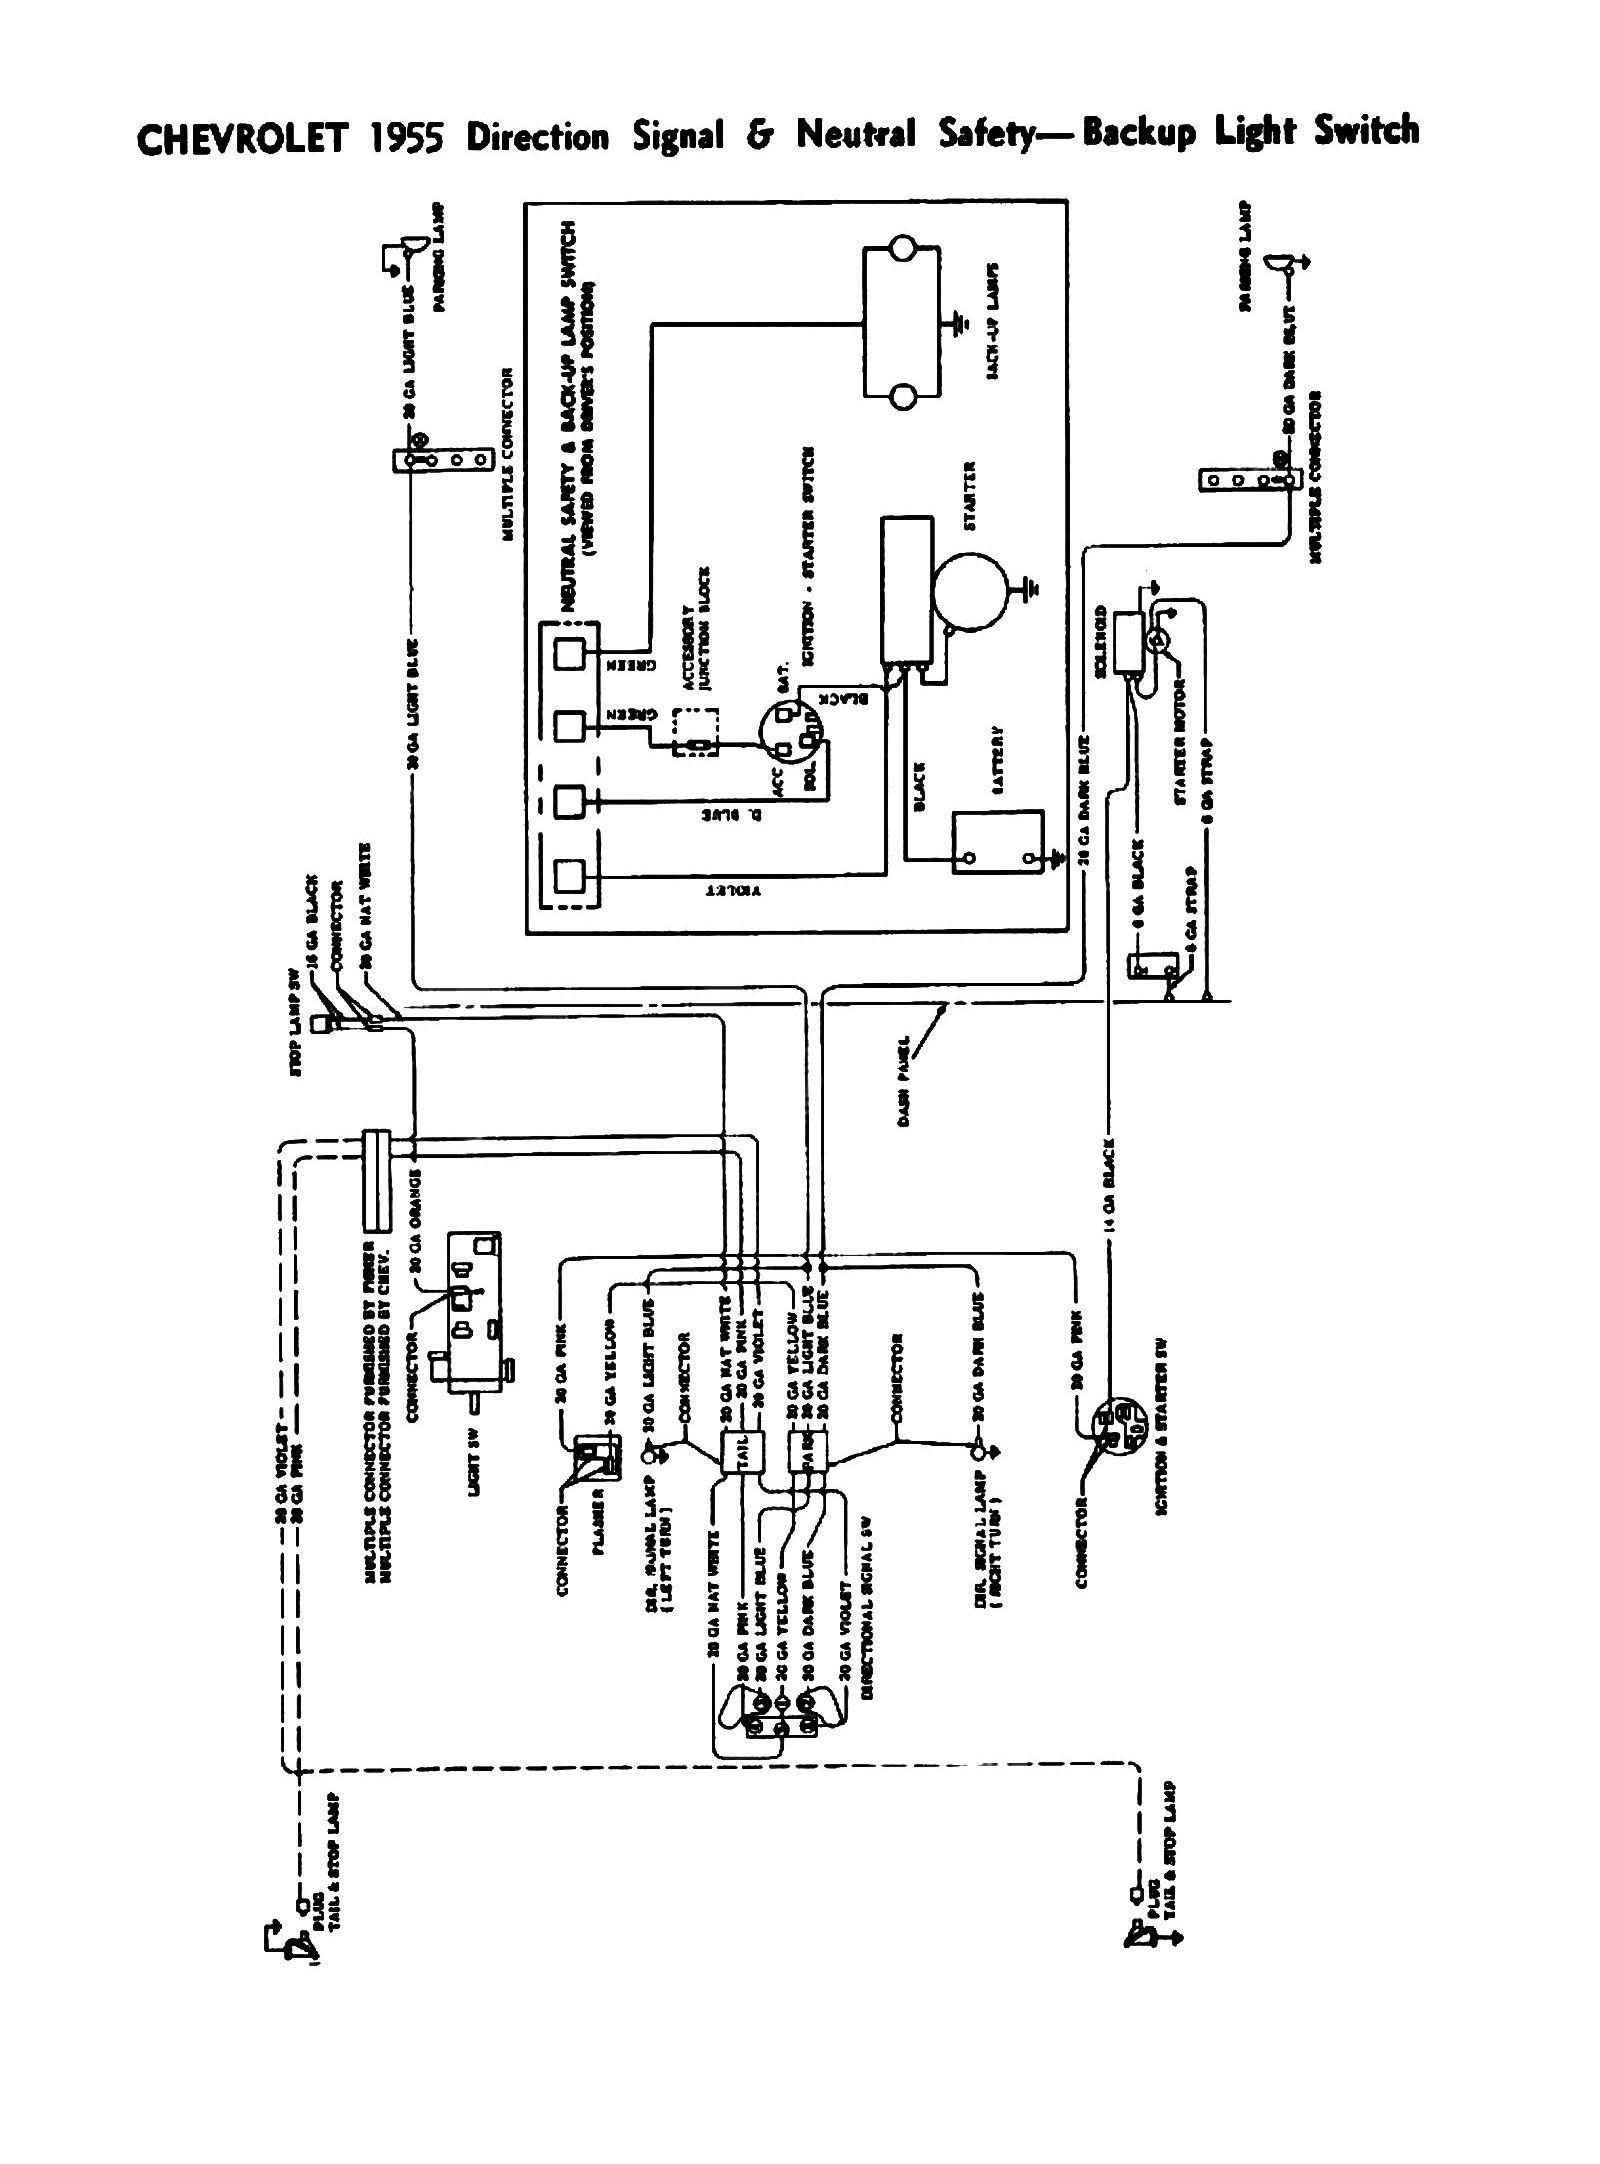 Printable Garmin Striker 4 Installation Instructions High Beam Fuse Diagram 2007 F150 Of Printable Garmin Striker 4 Installation Instructions